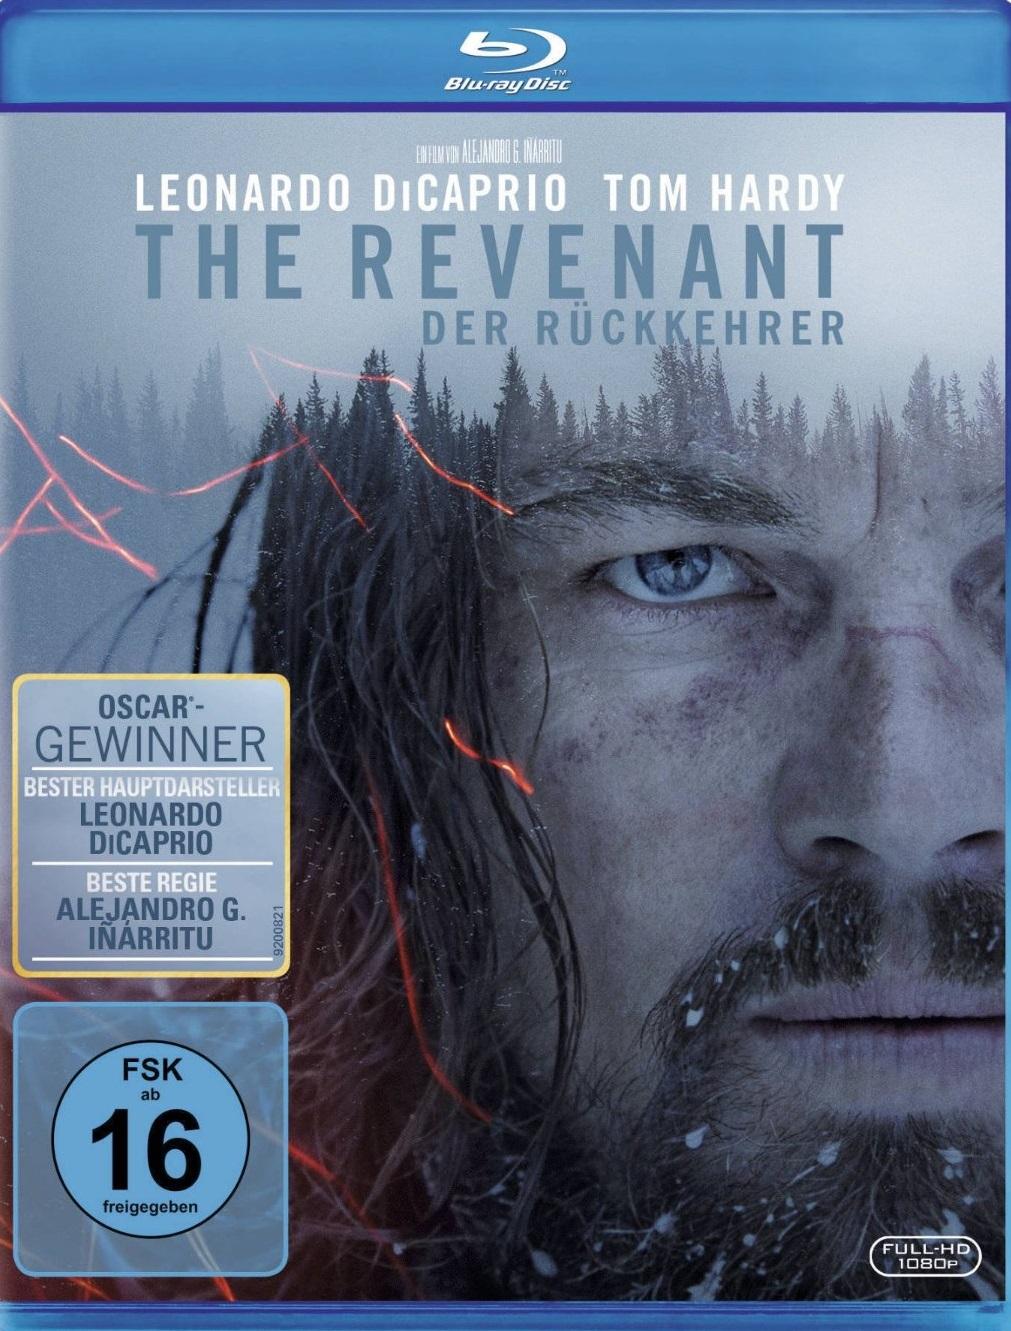 The Revenant - Der Rückkehrer Blu-ray Review, Rezension, Kritik